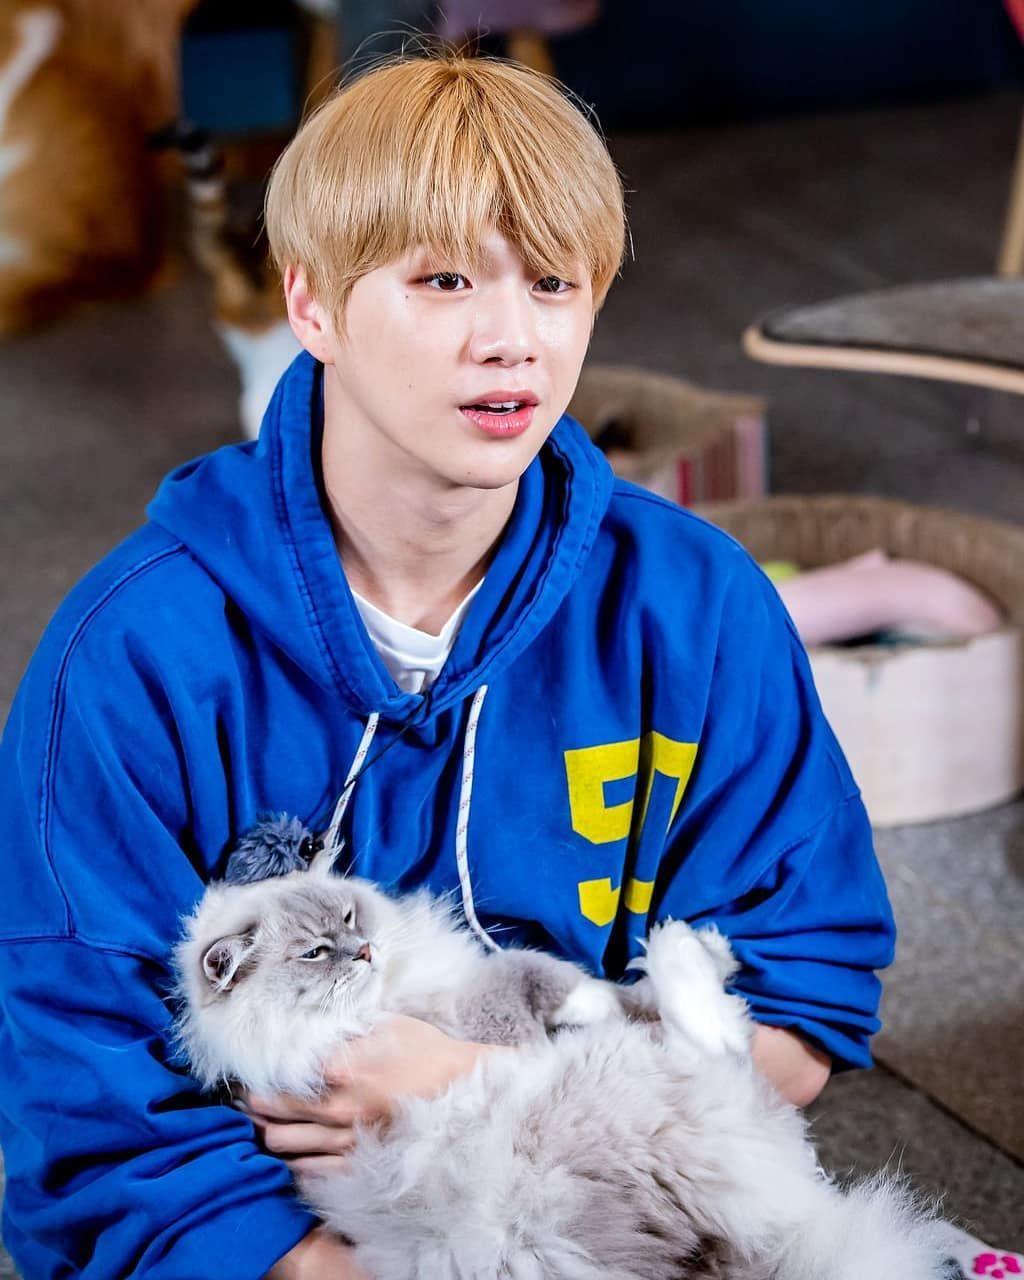 Kang Daniel X OSEN  #kangdaniel #osen #model #vlive #live #catman #cat #catperson #hug #konnectentertainment #ceo #idol ... #kangdaniel